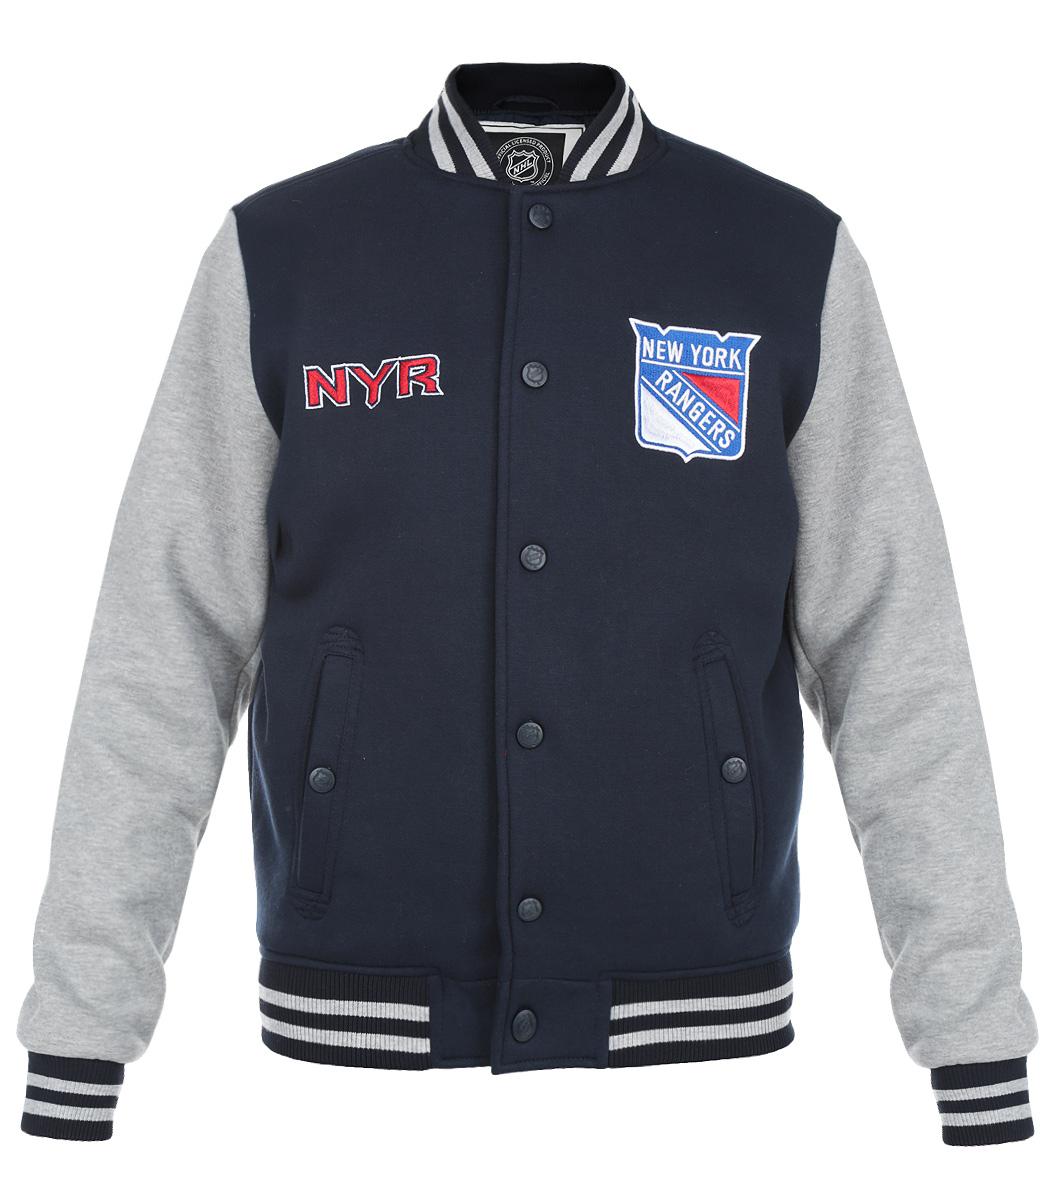 Ветровка мужская NHL NY Rangers, цвет:  темно-синий, серый меланж.  57040.  Размер M (48) NHL